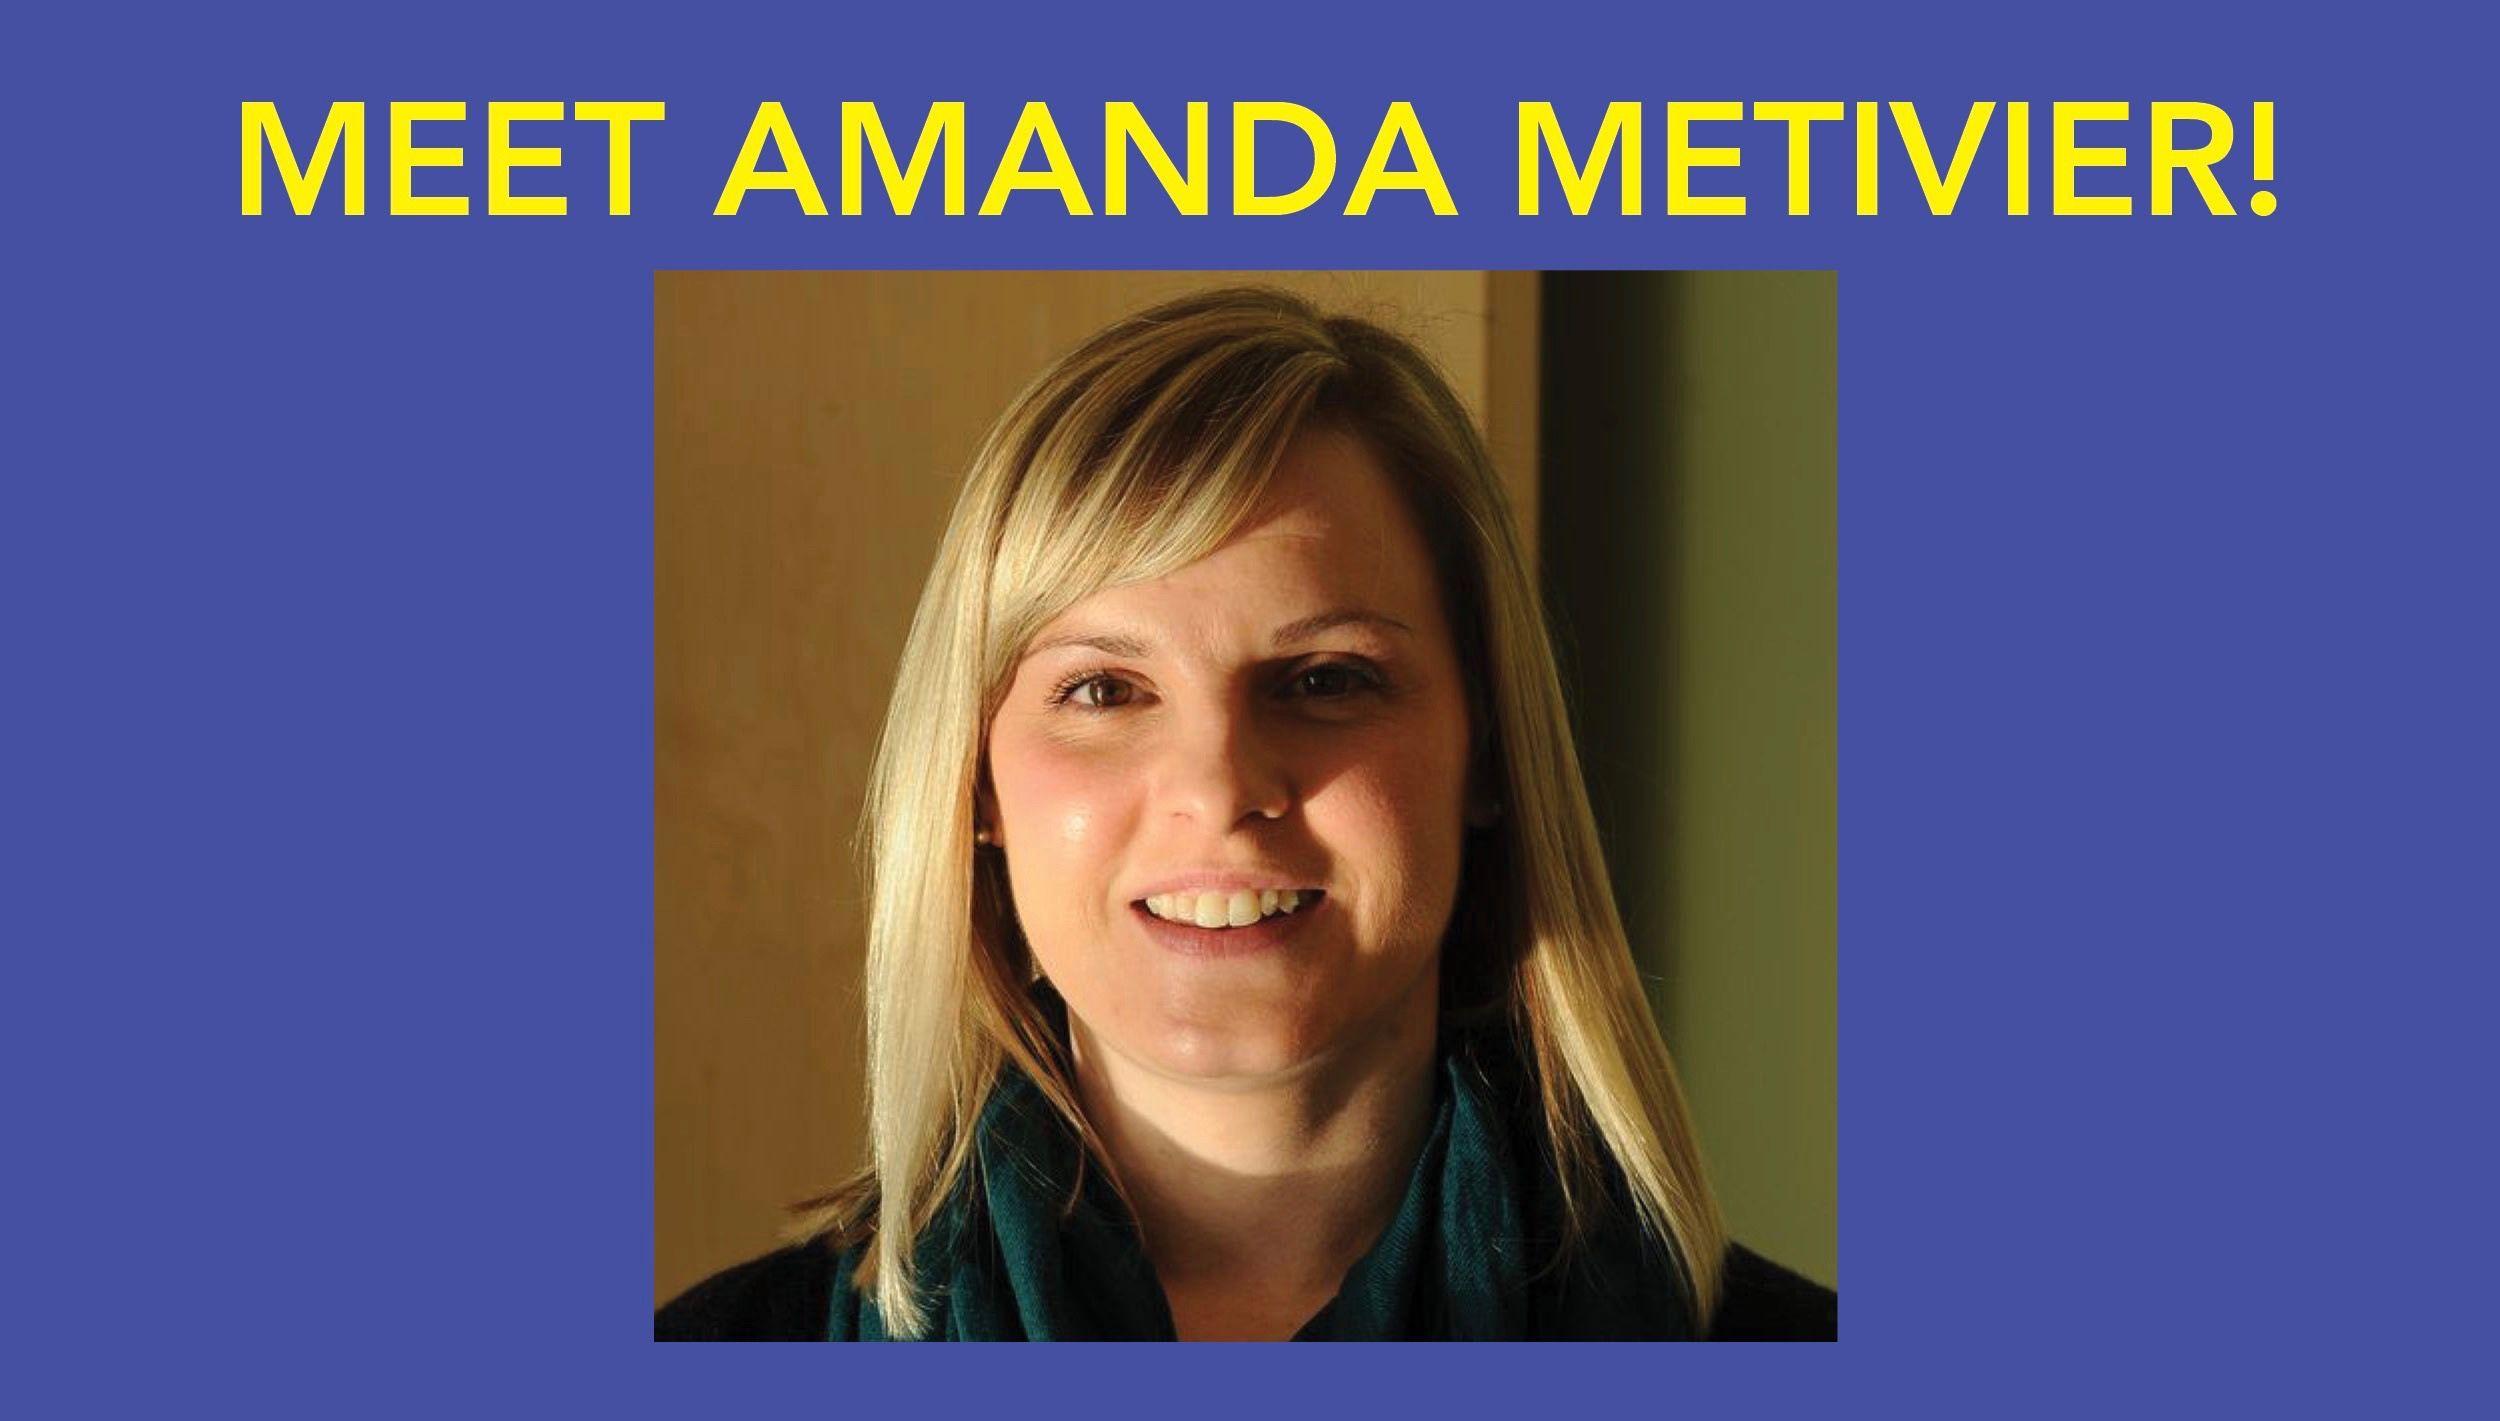 Meet Amanda Metivier